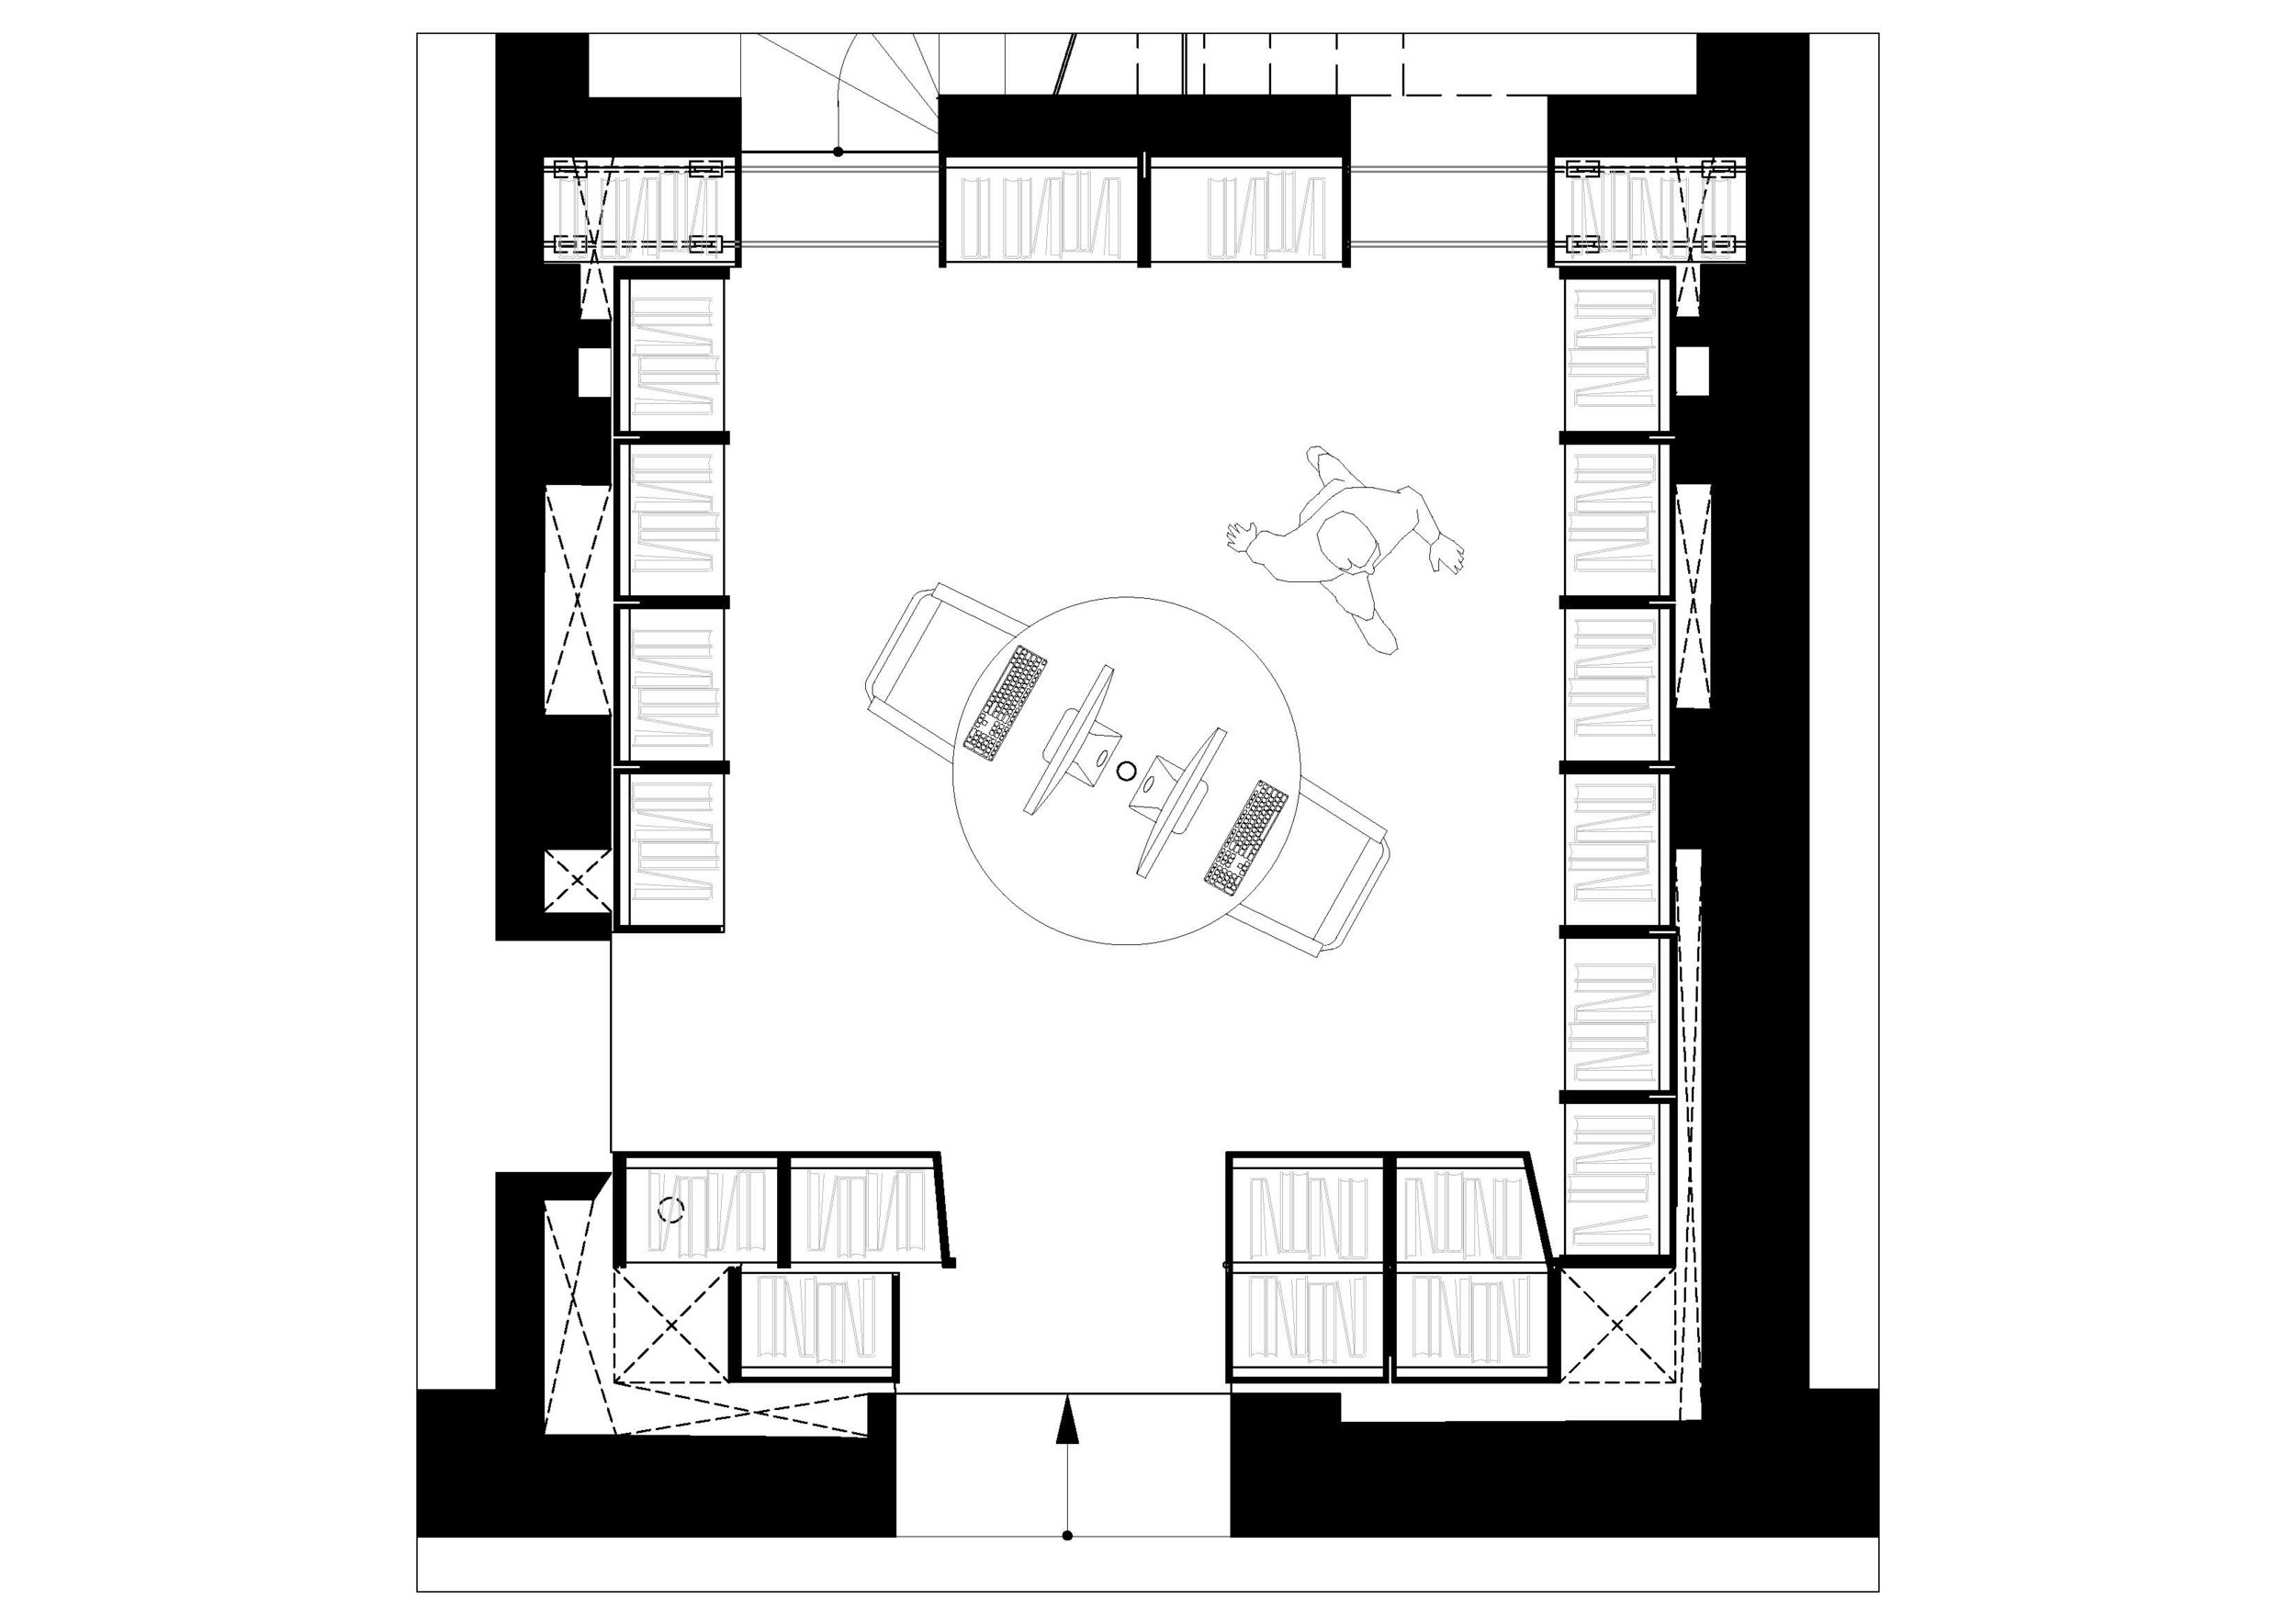 Barn_floor plan_library OPEN.jpg